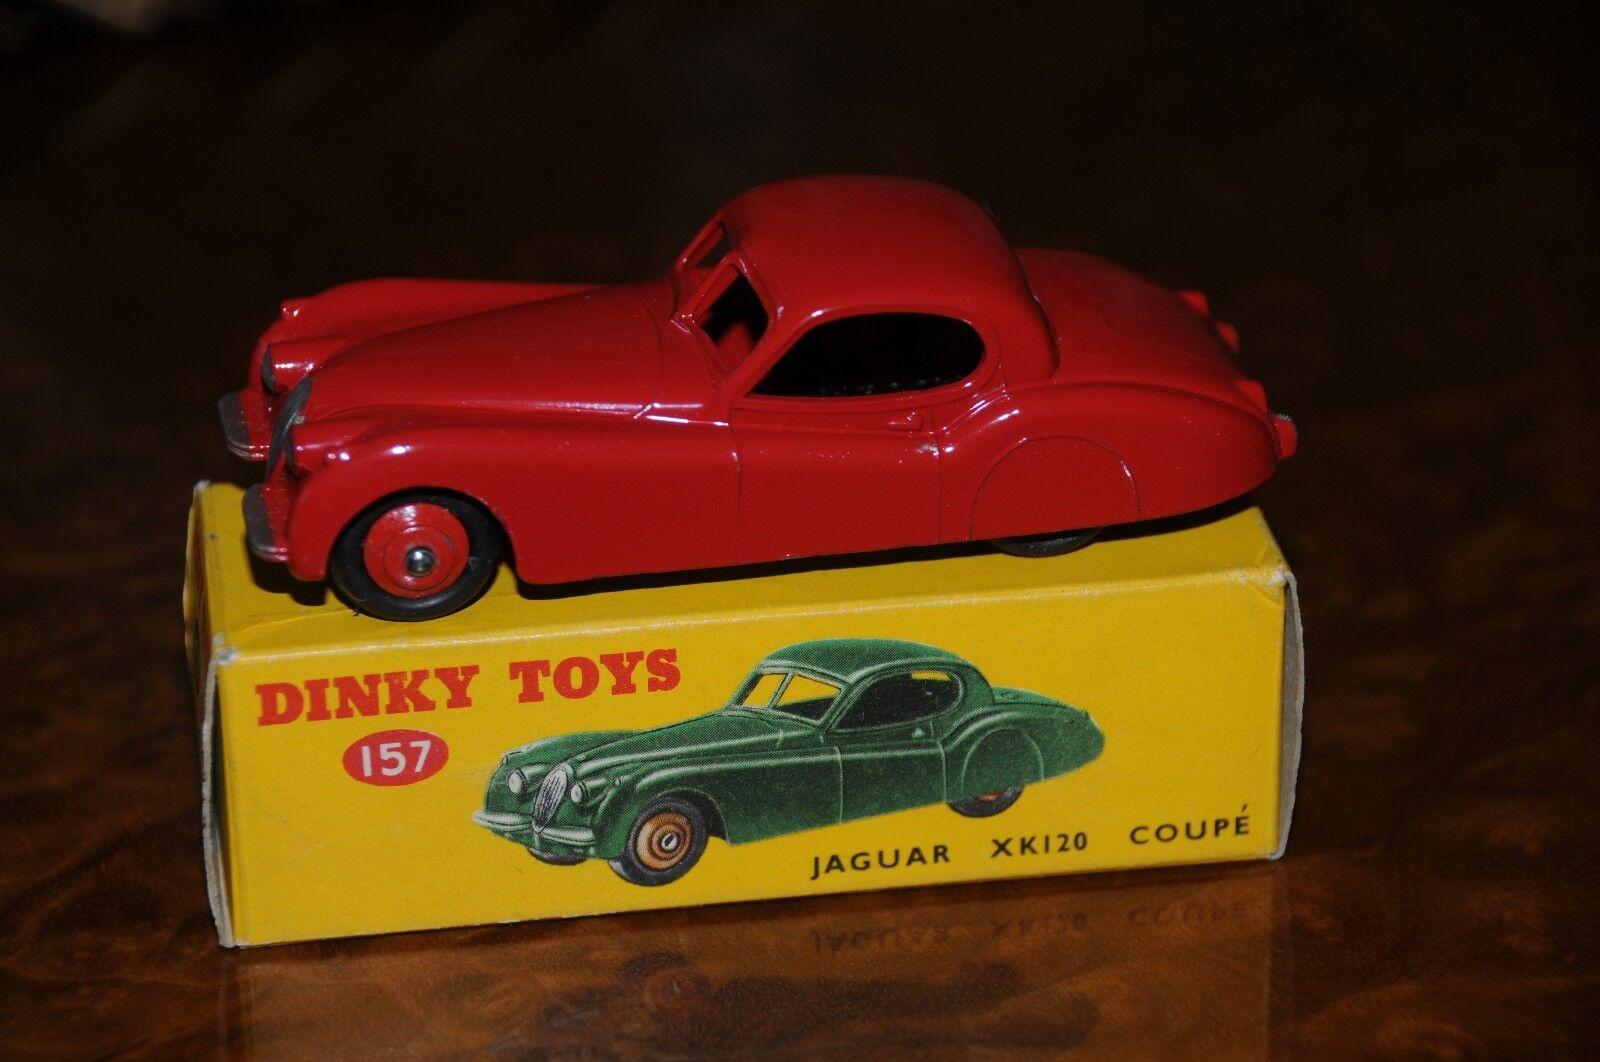 Vintage Dinky Toys   MIB   Red Jaguar XK120 Coupe   No. 157